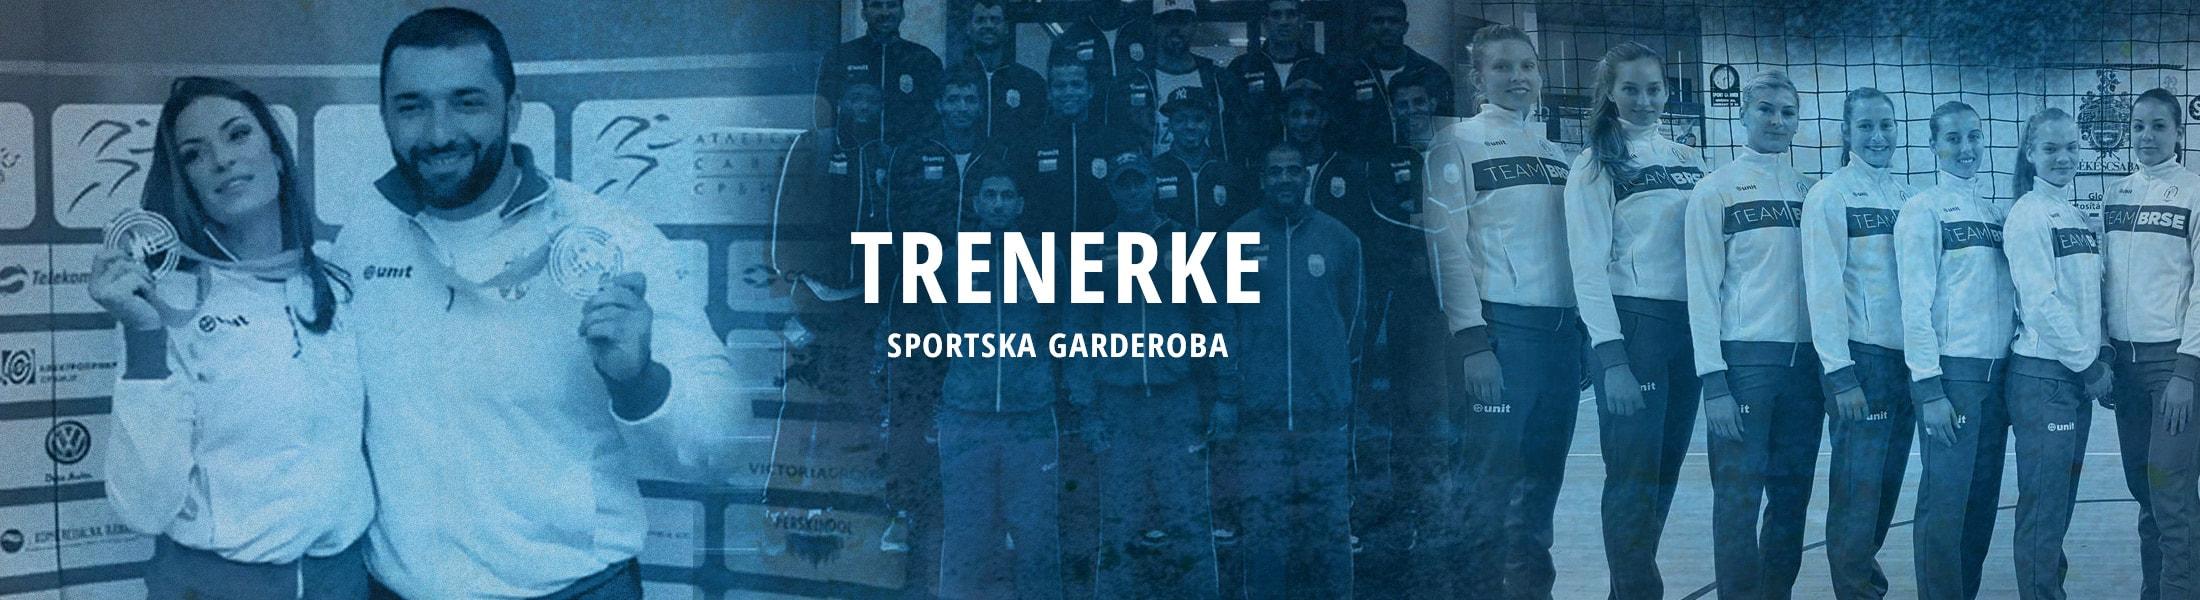 Sportska garderoba - Trenerke